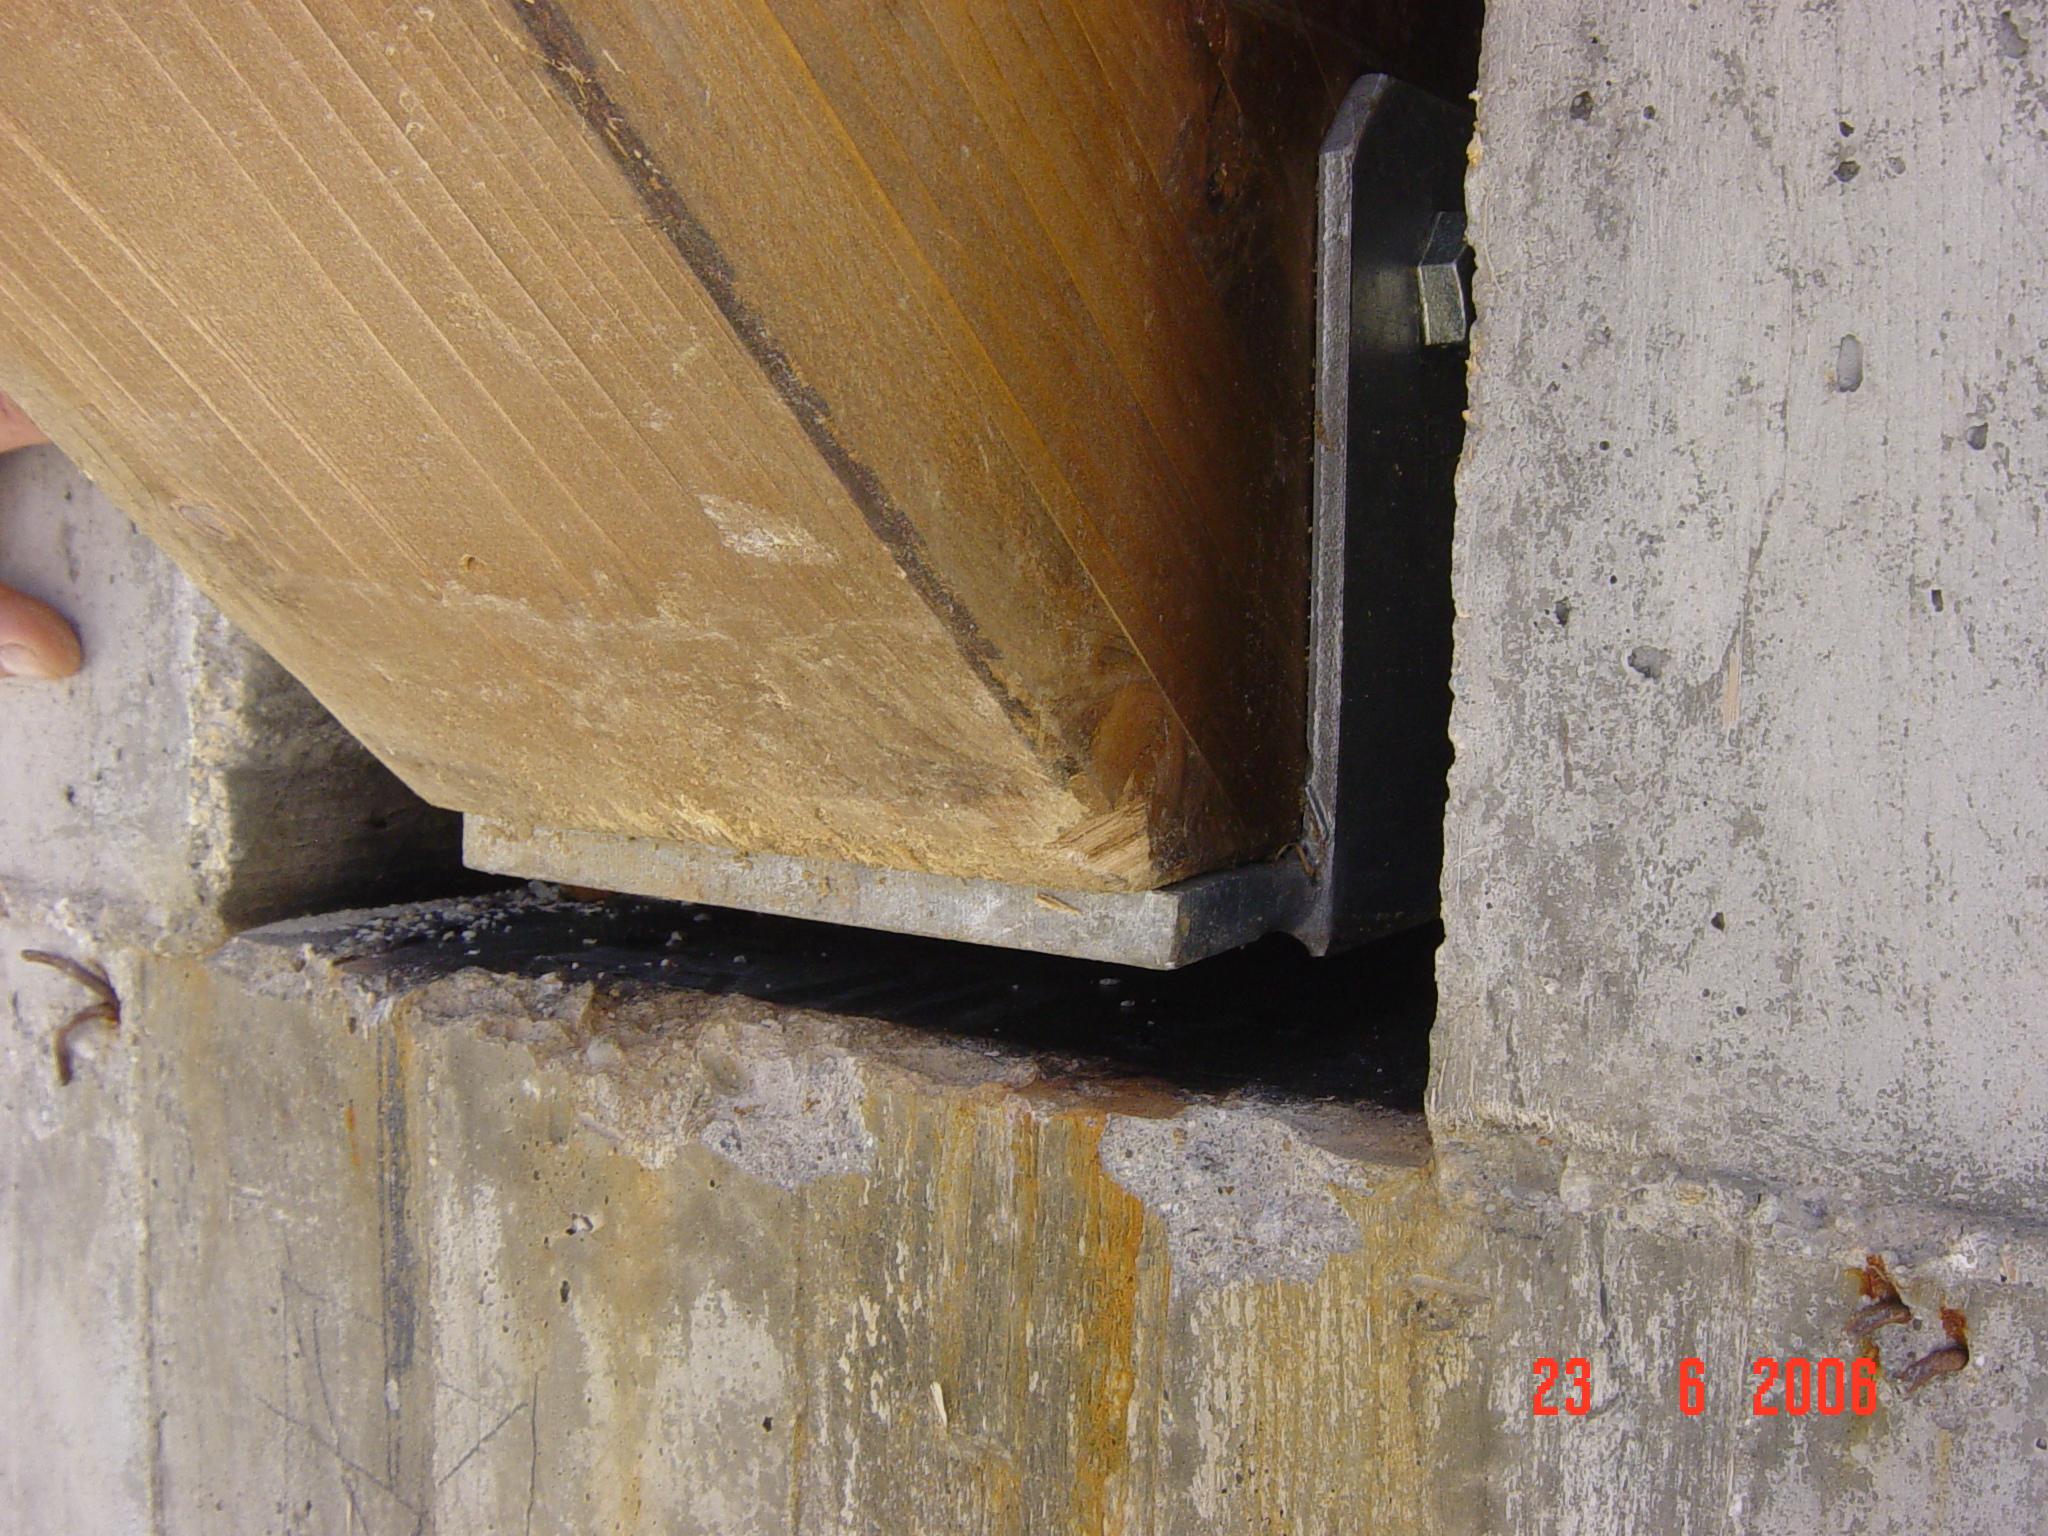 Nodo trave-pilastro del telaio - fig.7